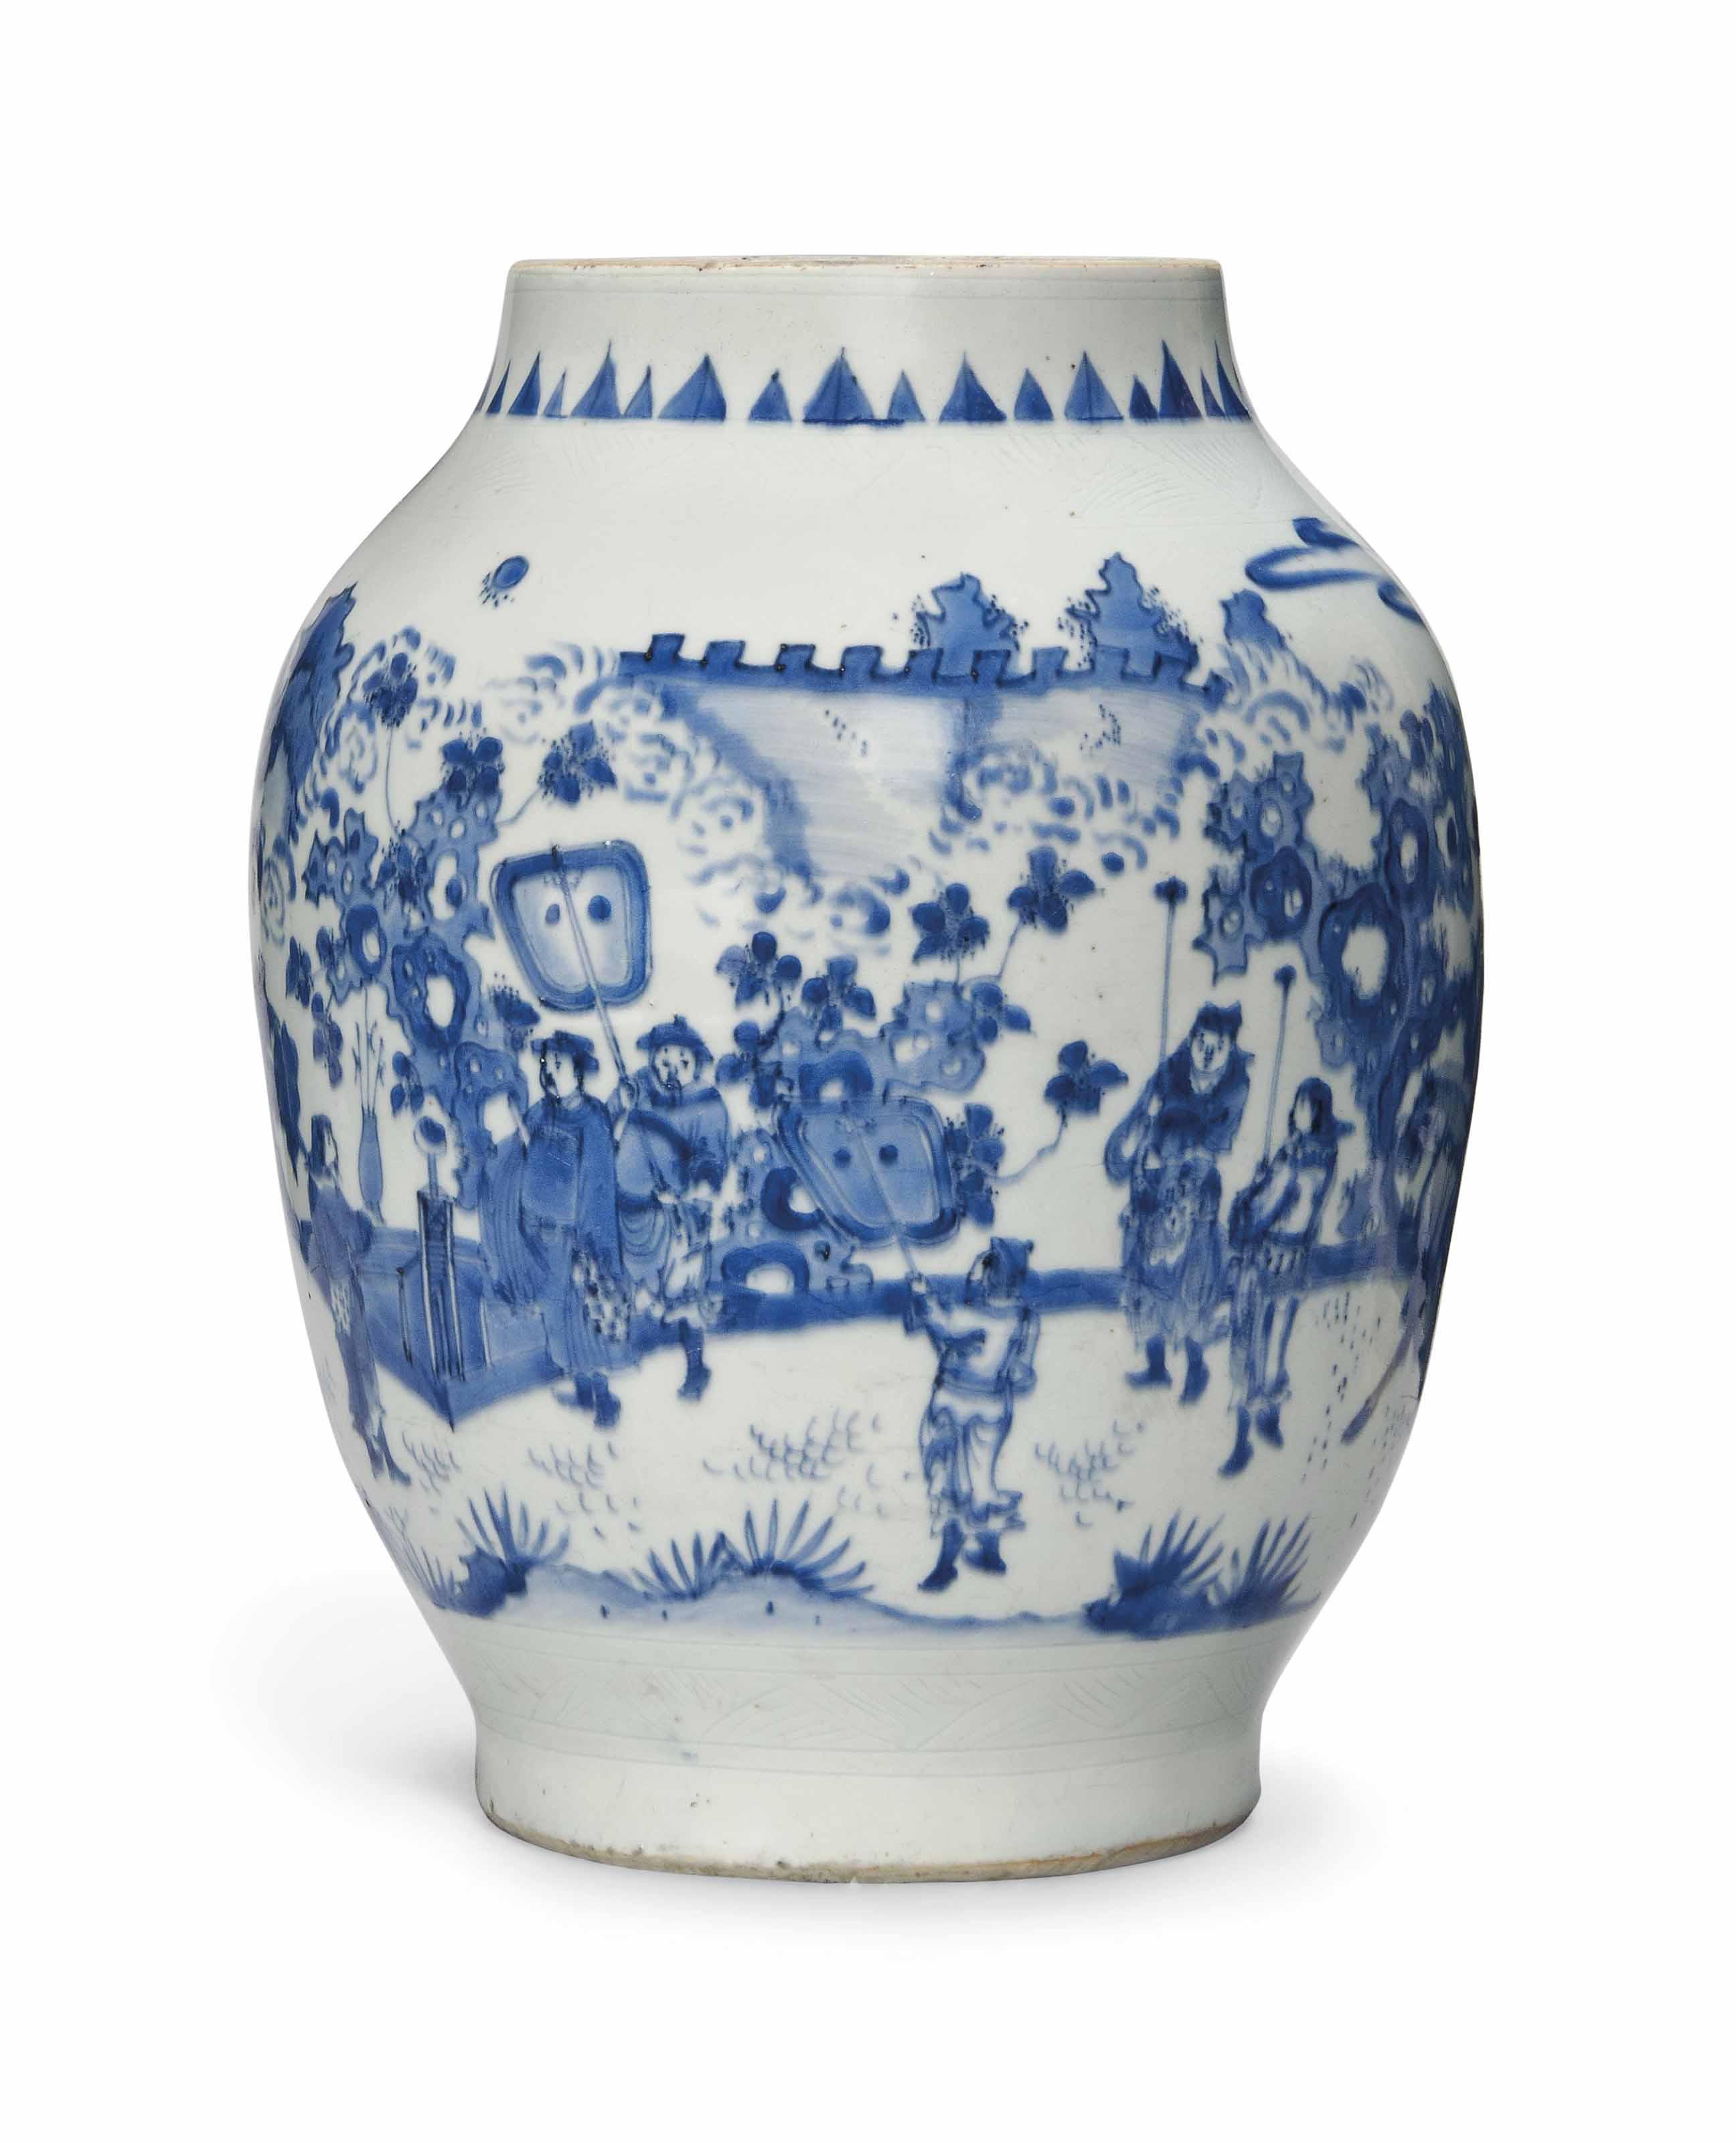 A LARGE BLUE AND WHITE OVIFORM JAR